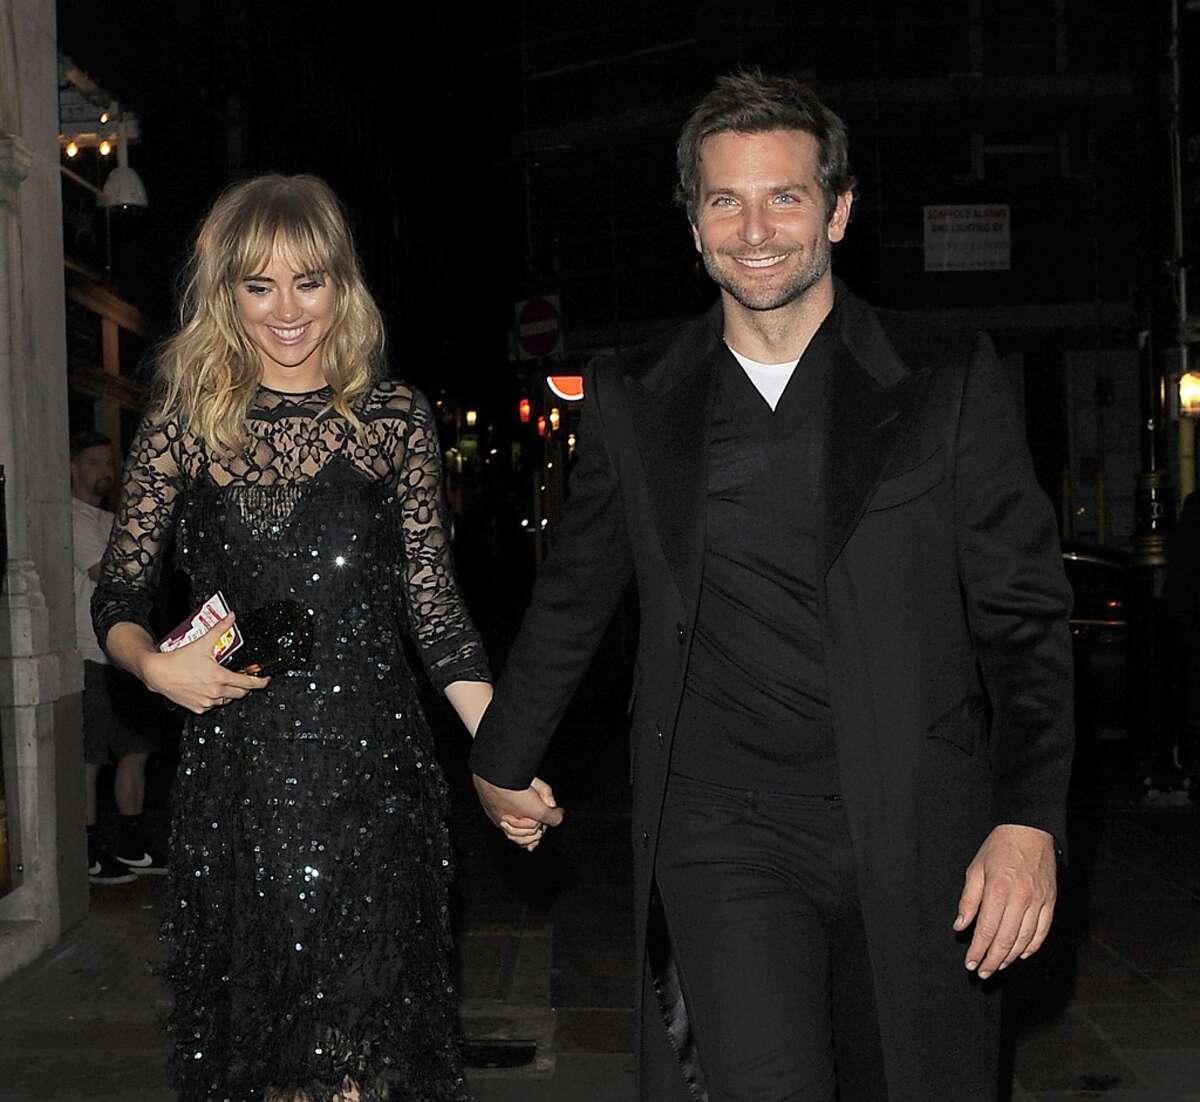 Suki Waterhouse and Bradley Cooper head to J Sheeky restaurant for dinner on September 15, 2014 in London, England.